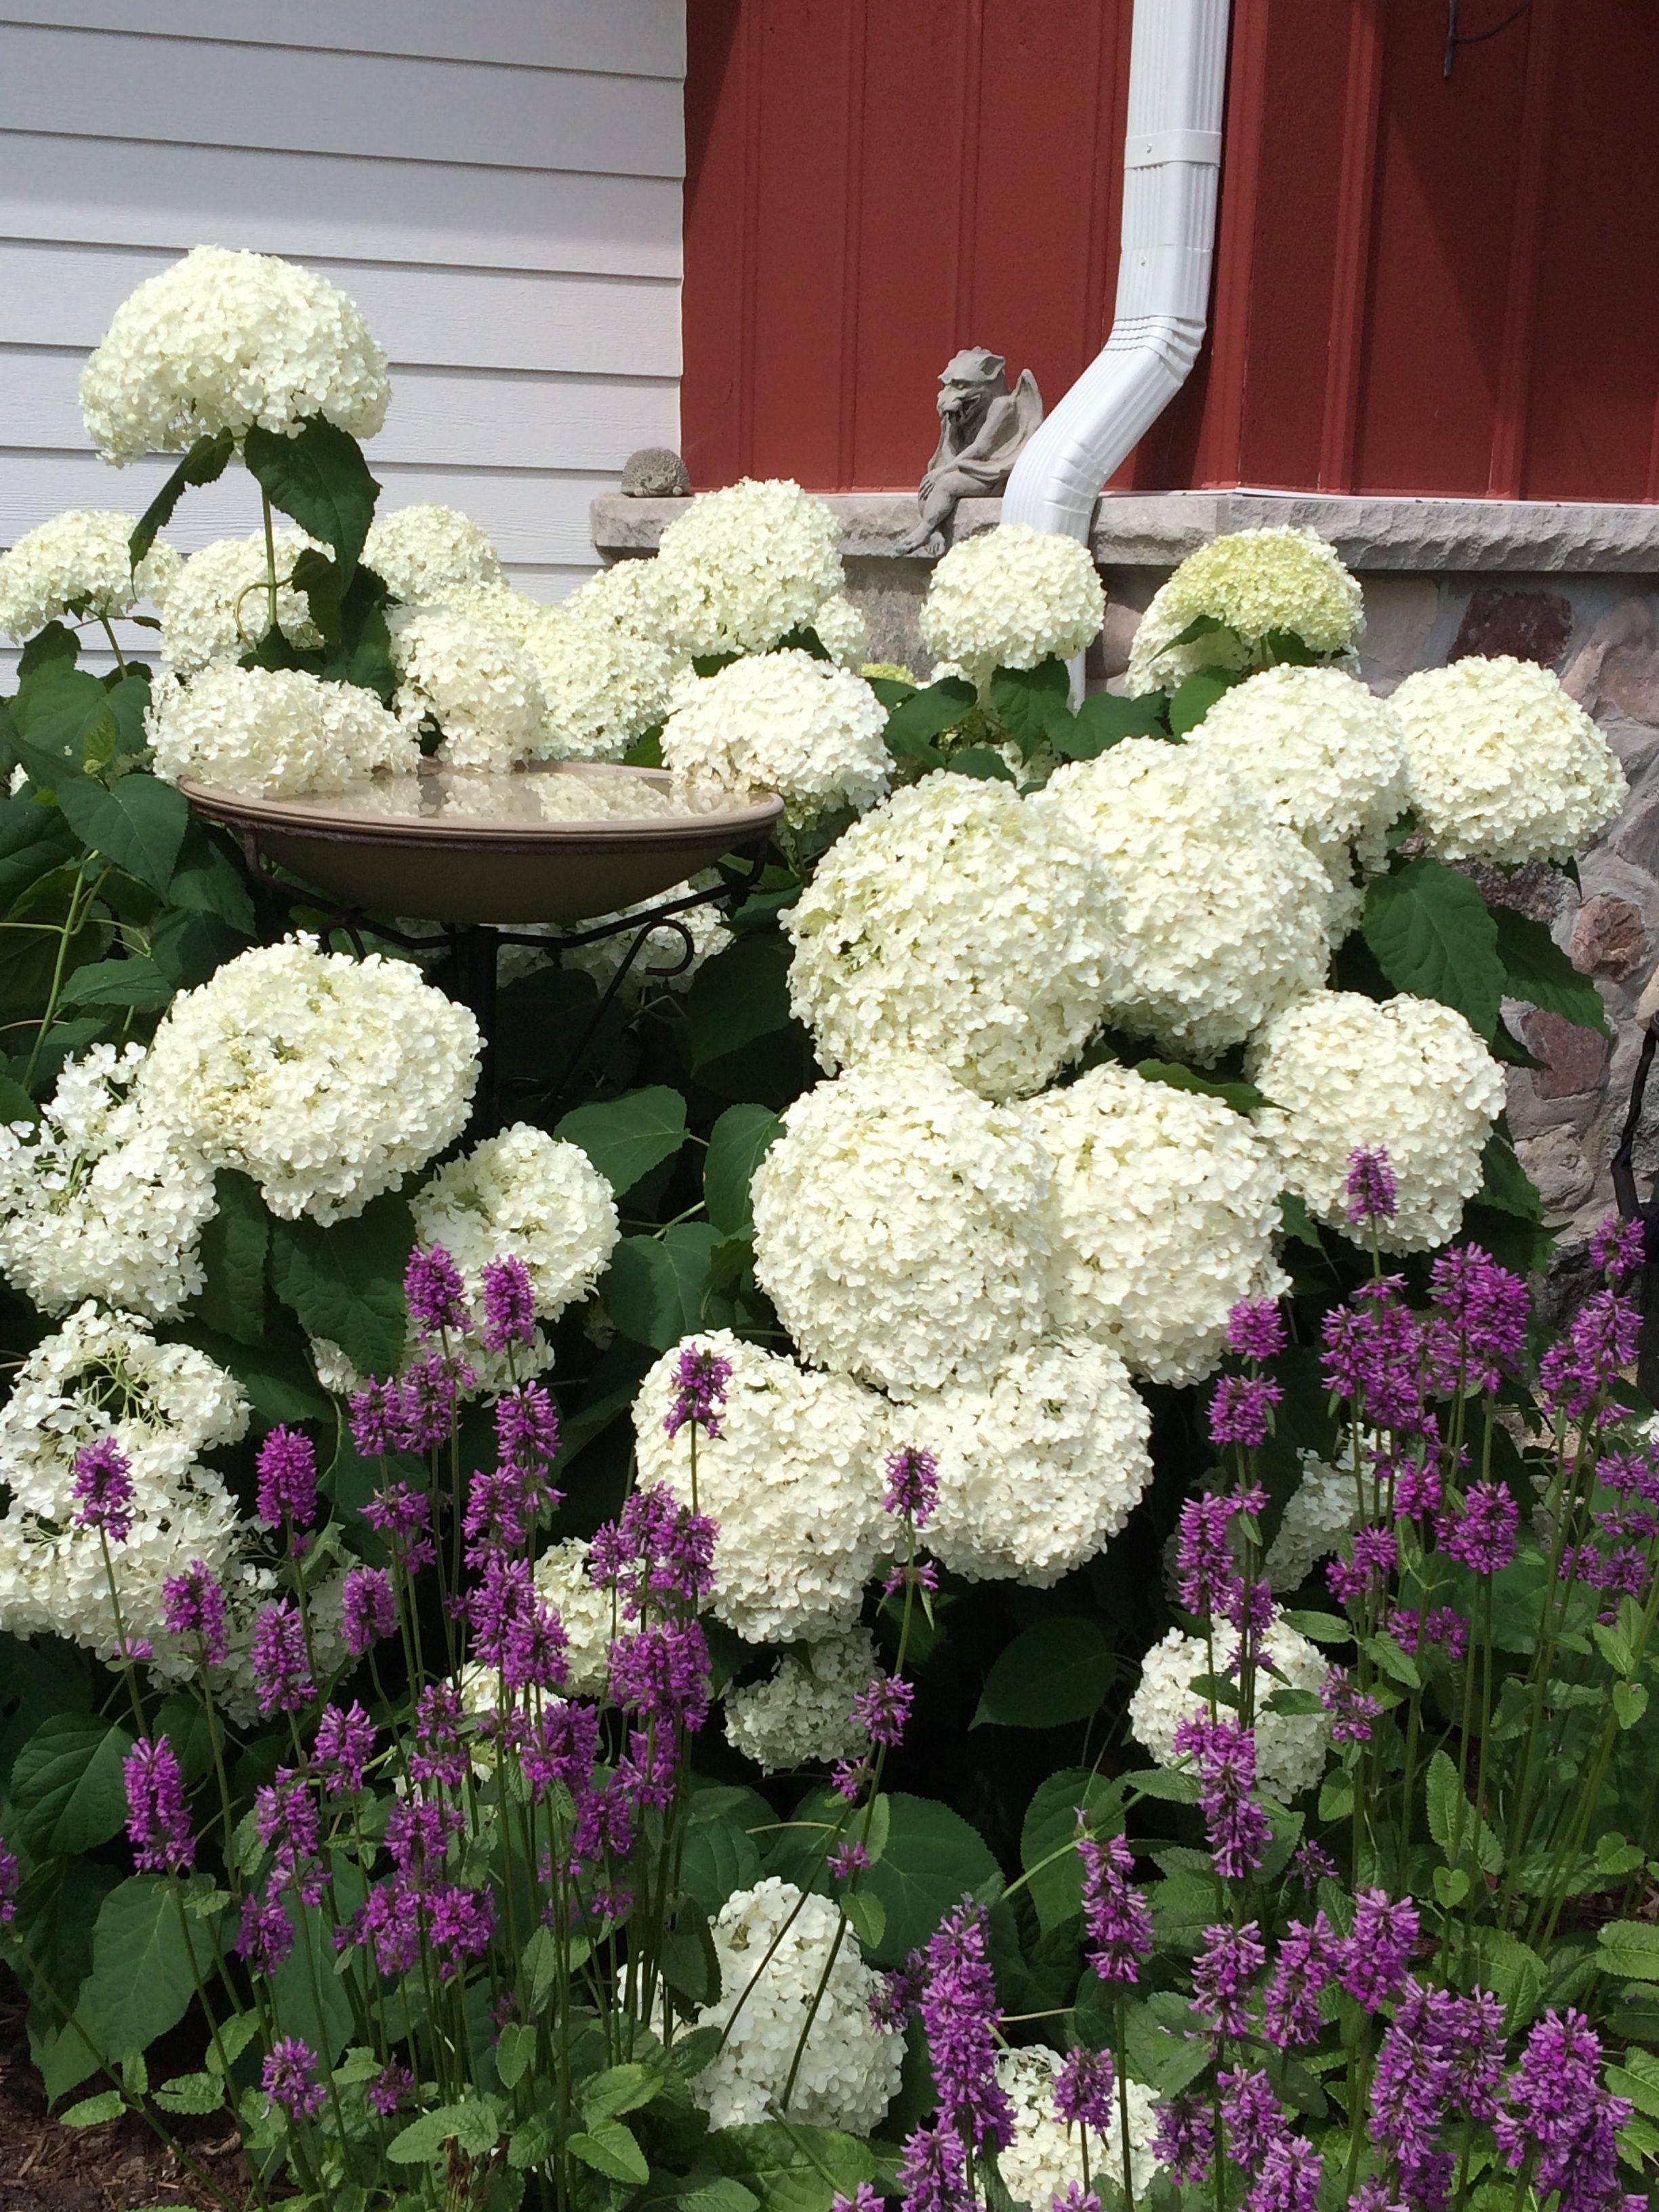 Stachys Hummelo And Annabelle Hydrangea Love Them Together Annabelle Hydrangea Planting Hydrangeas Hydrangea Varieties